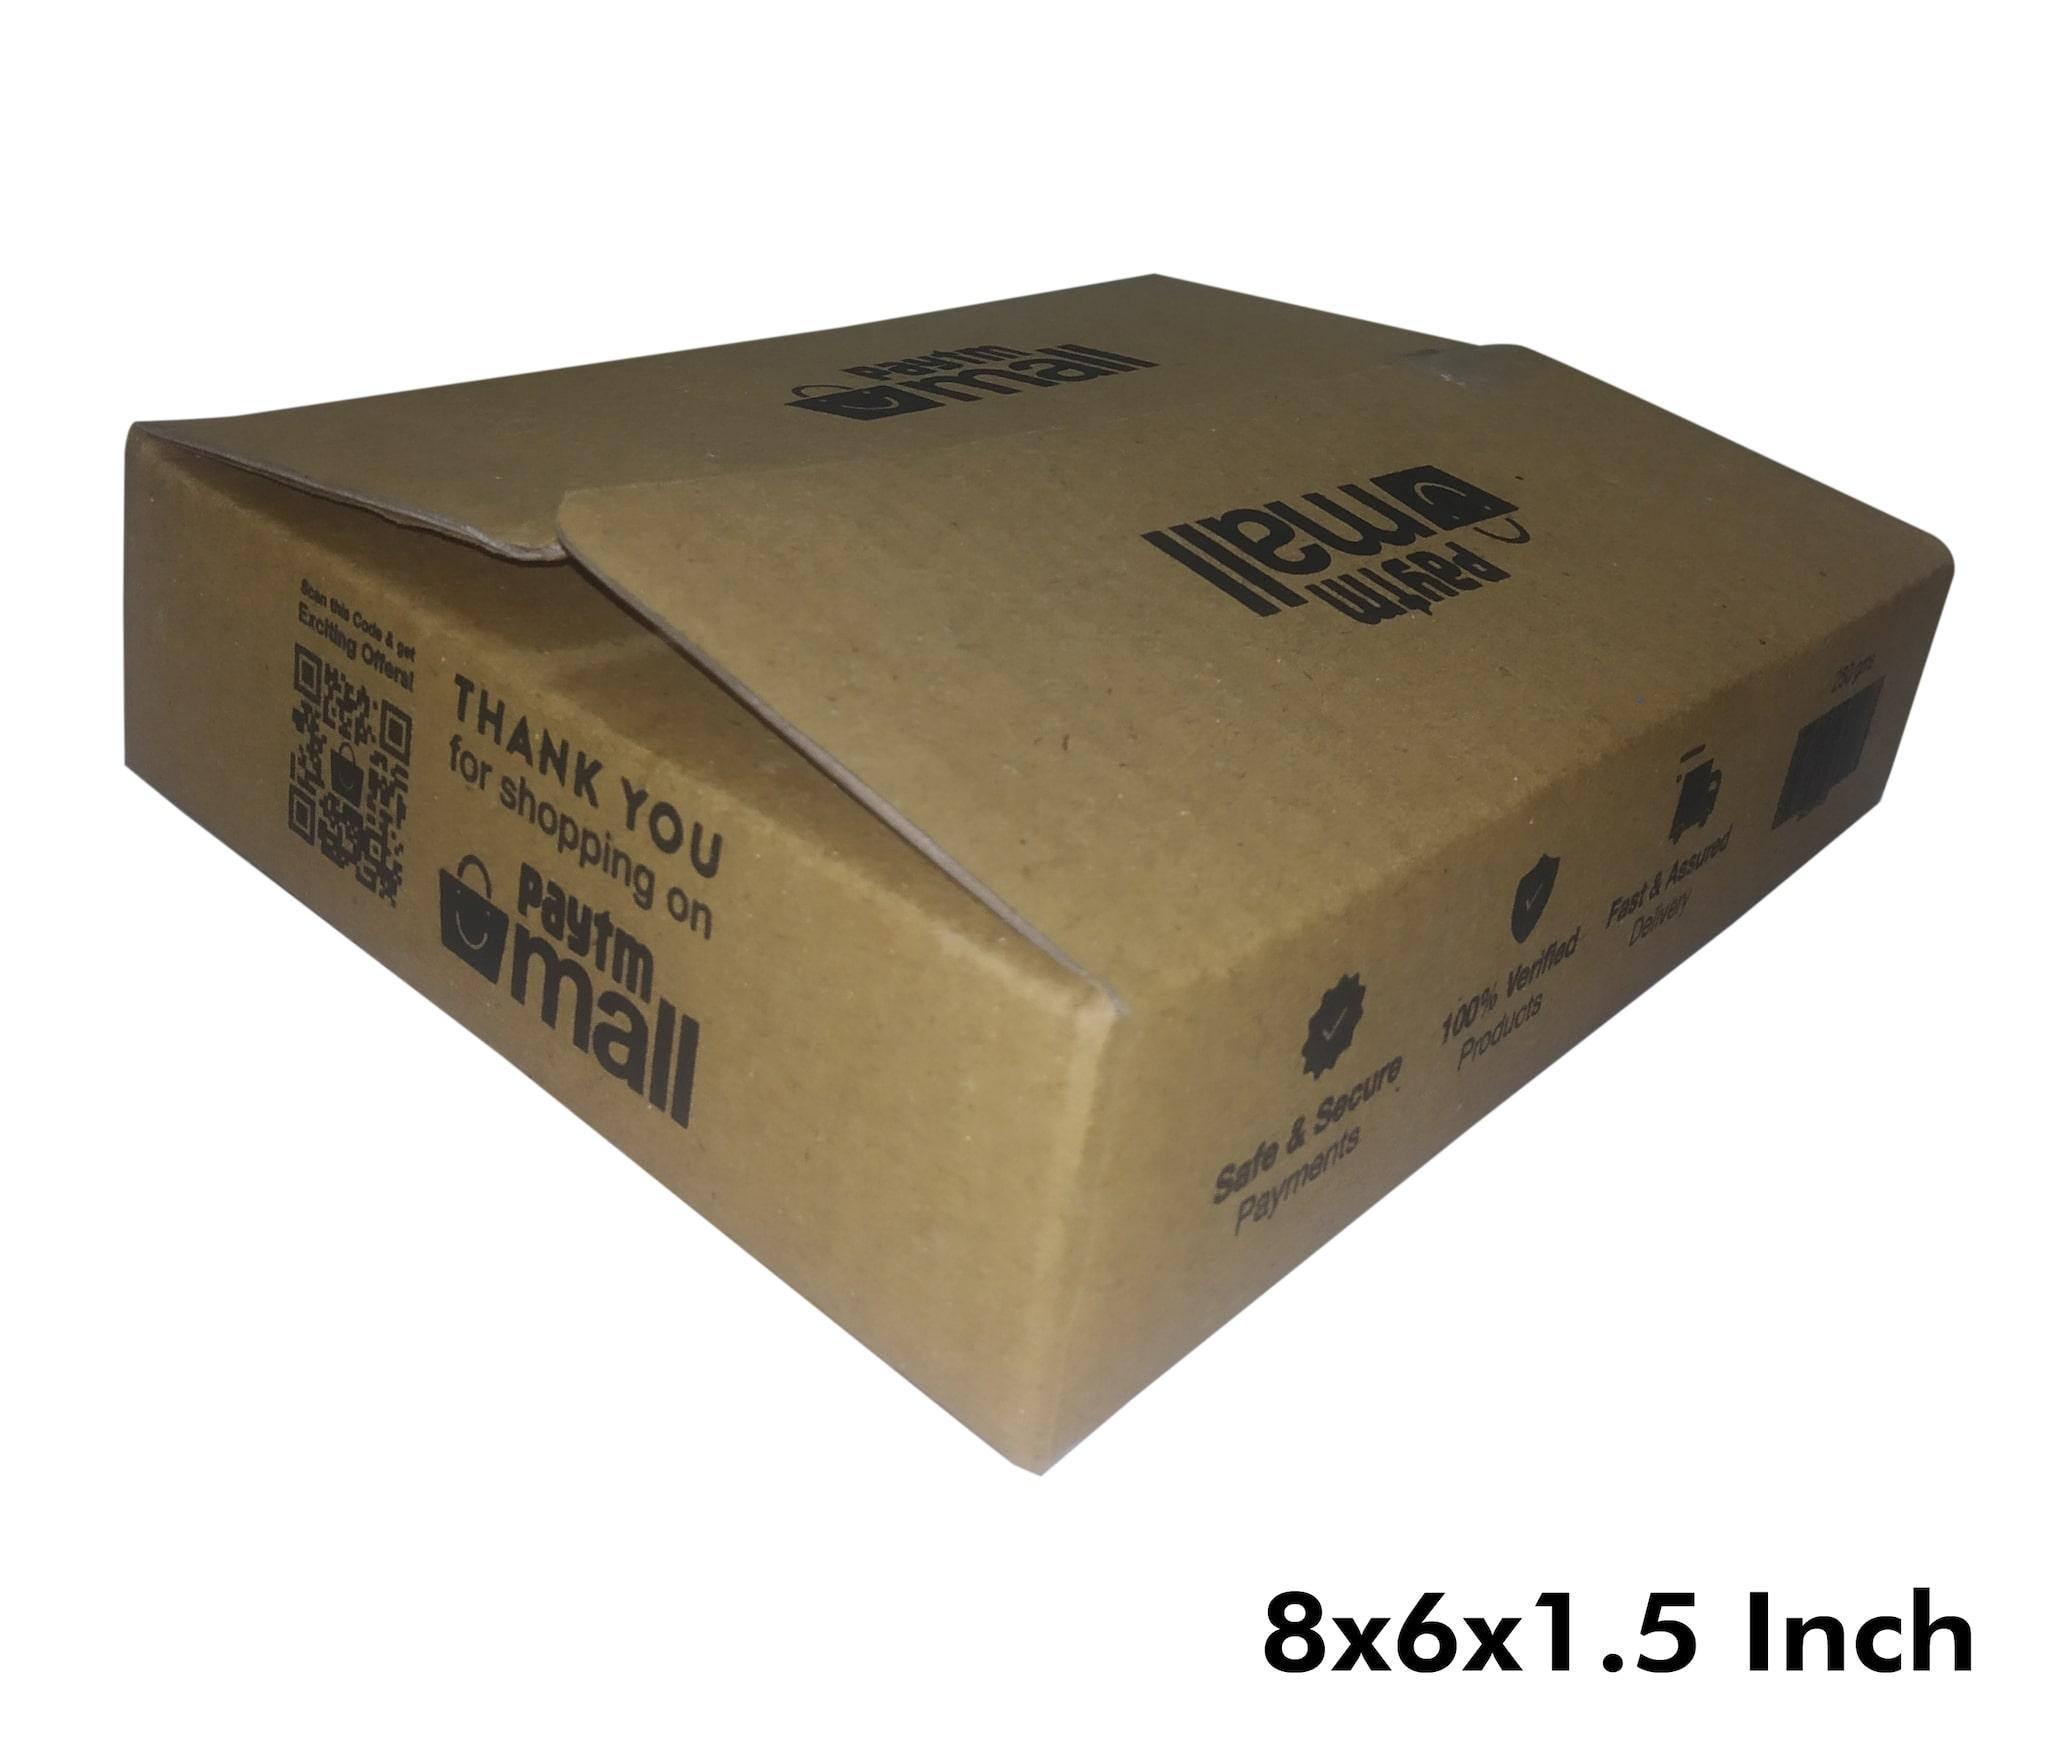 https://assetscdn1.paytm.com/images/catalog/product/F/FU/FUL250-GMS-PT03MERC950568DC2CC5C6/0..jpg